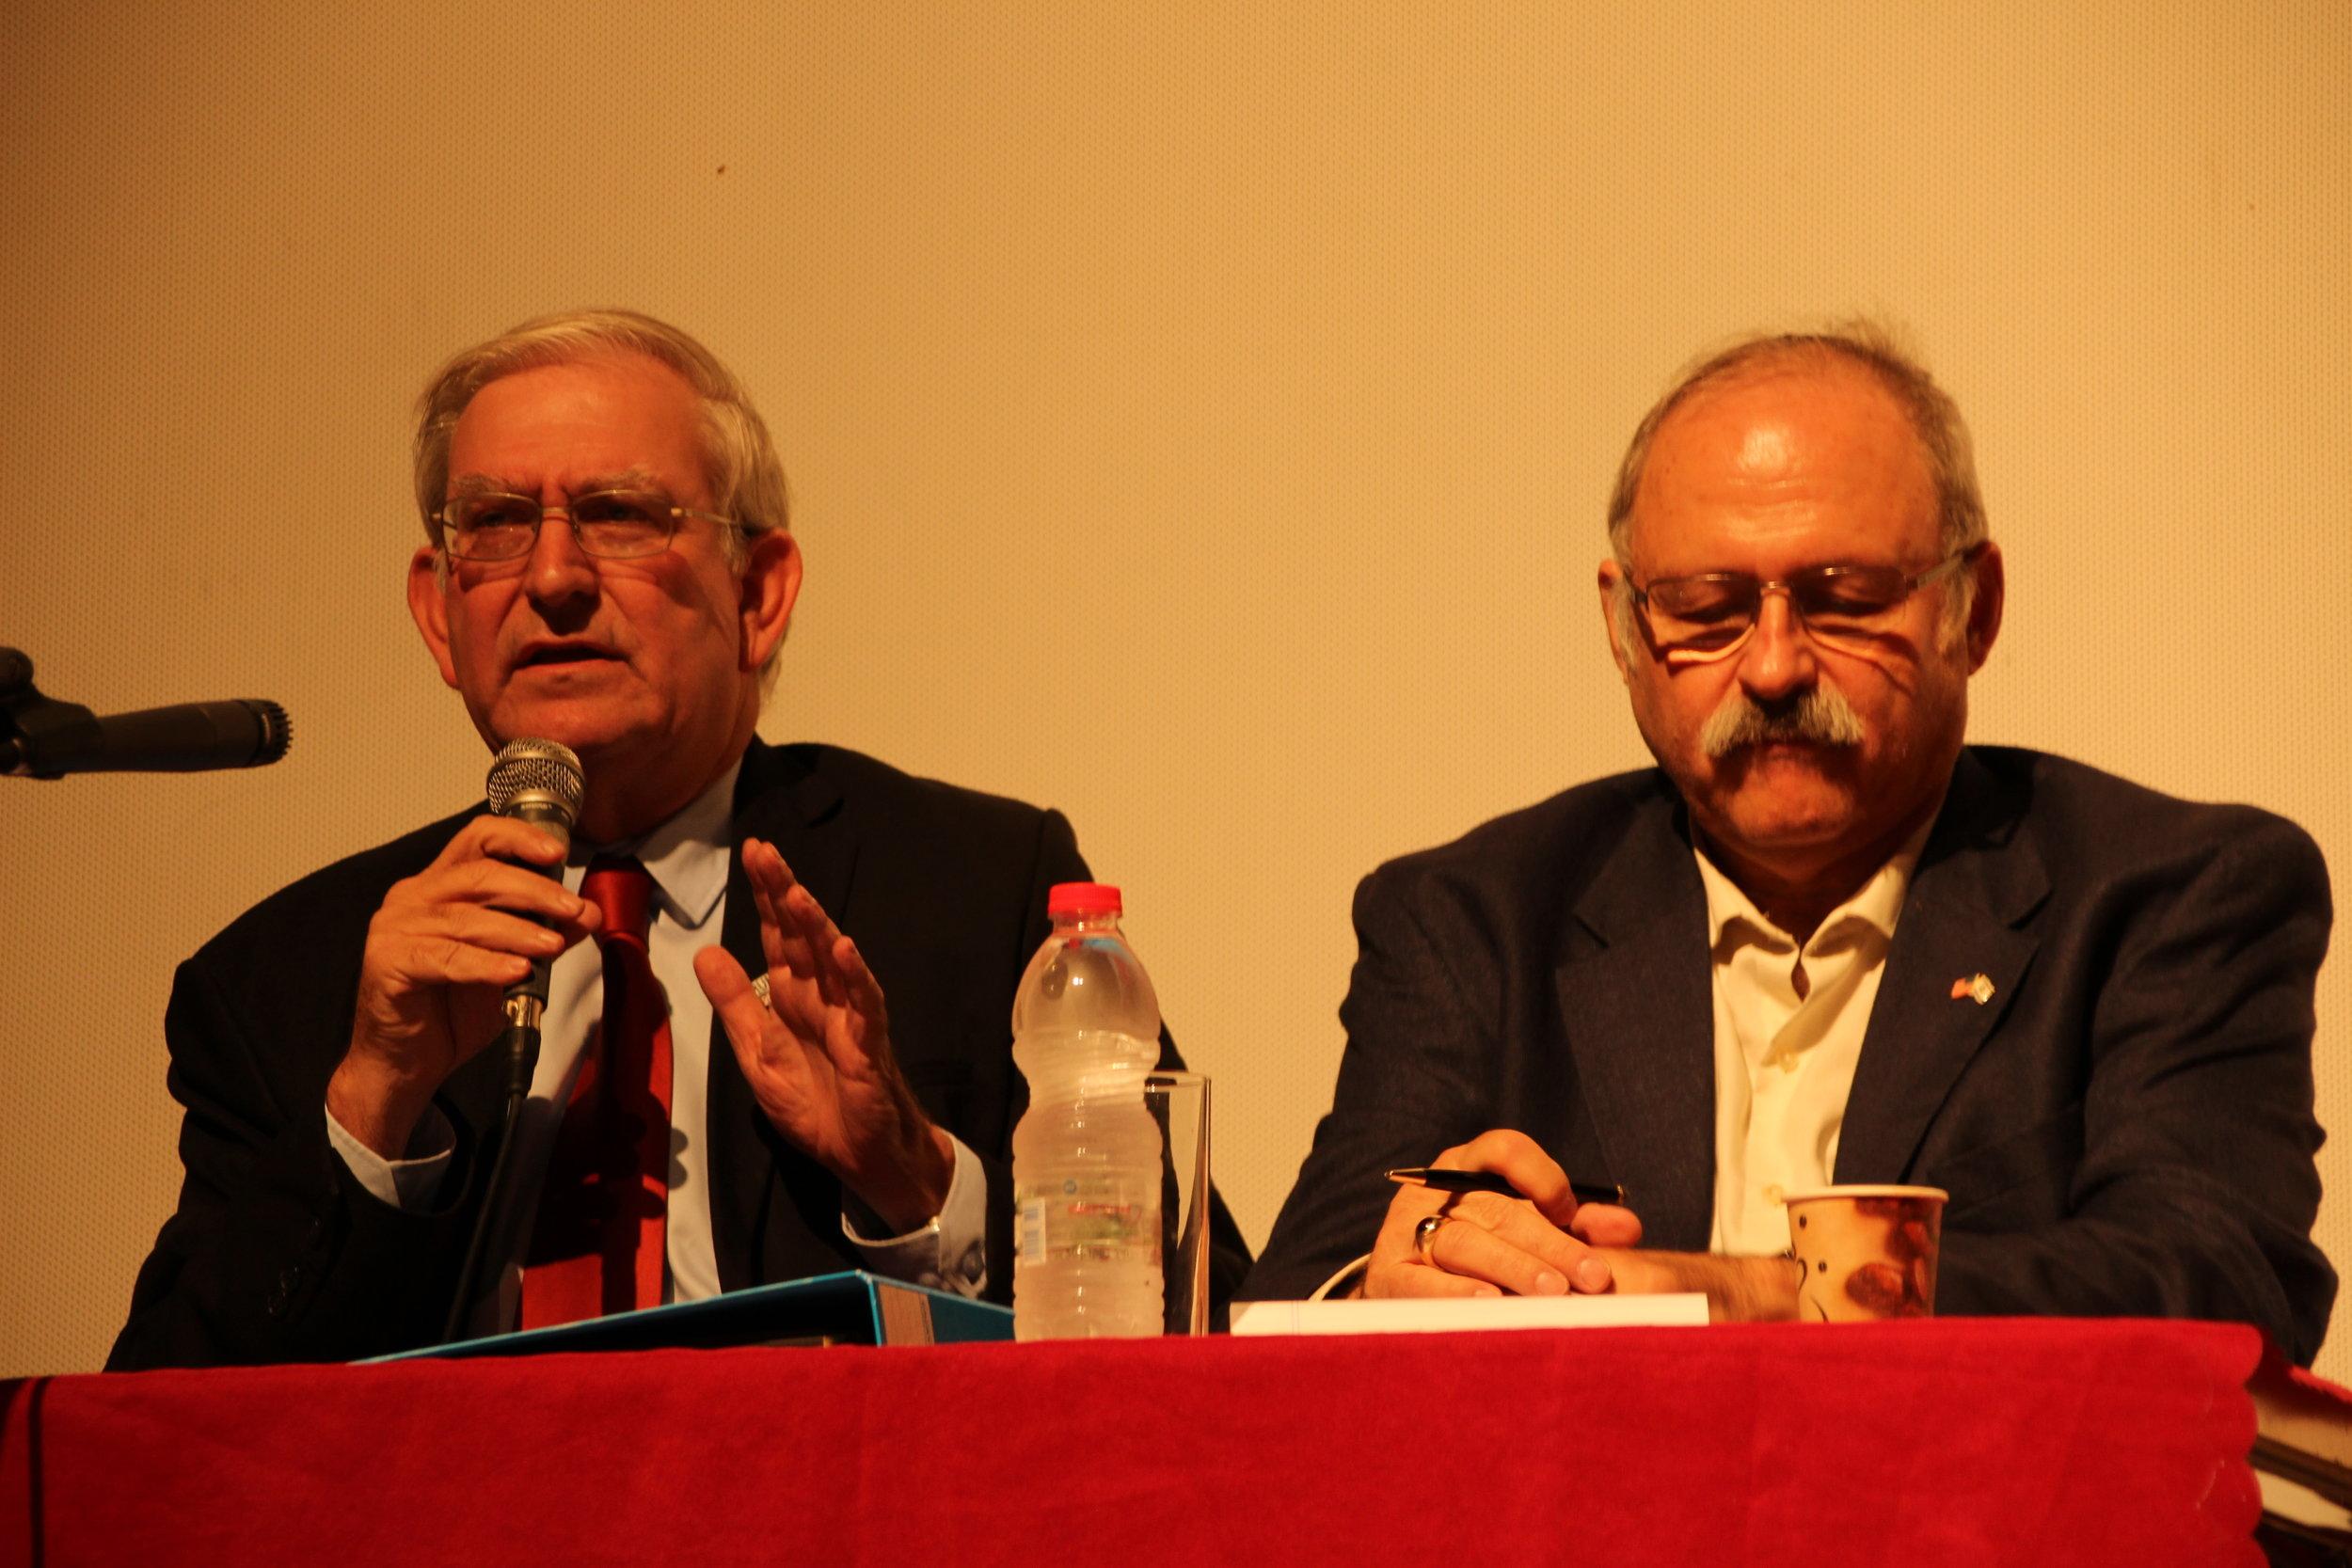 20161005 - Mark Zell (GOP) & Sheldon Schorer (Dem) debate.JPG